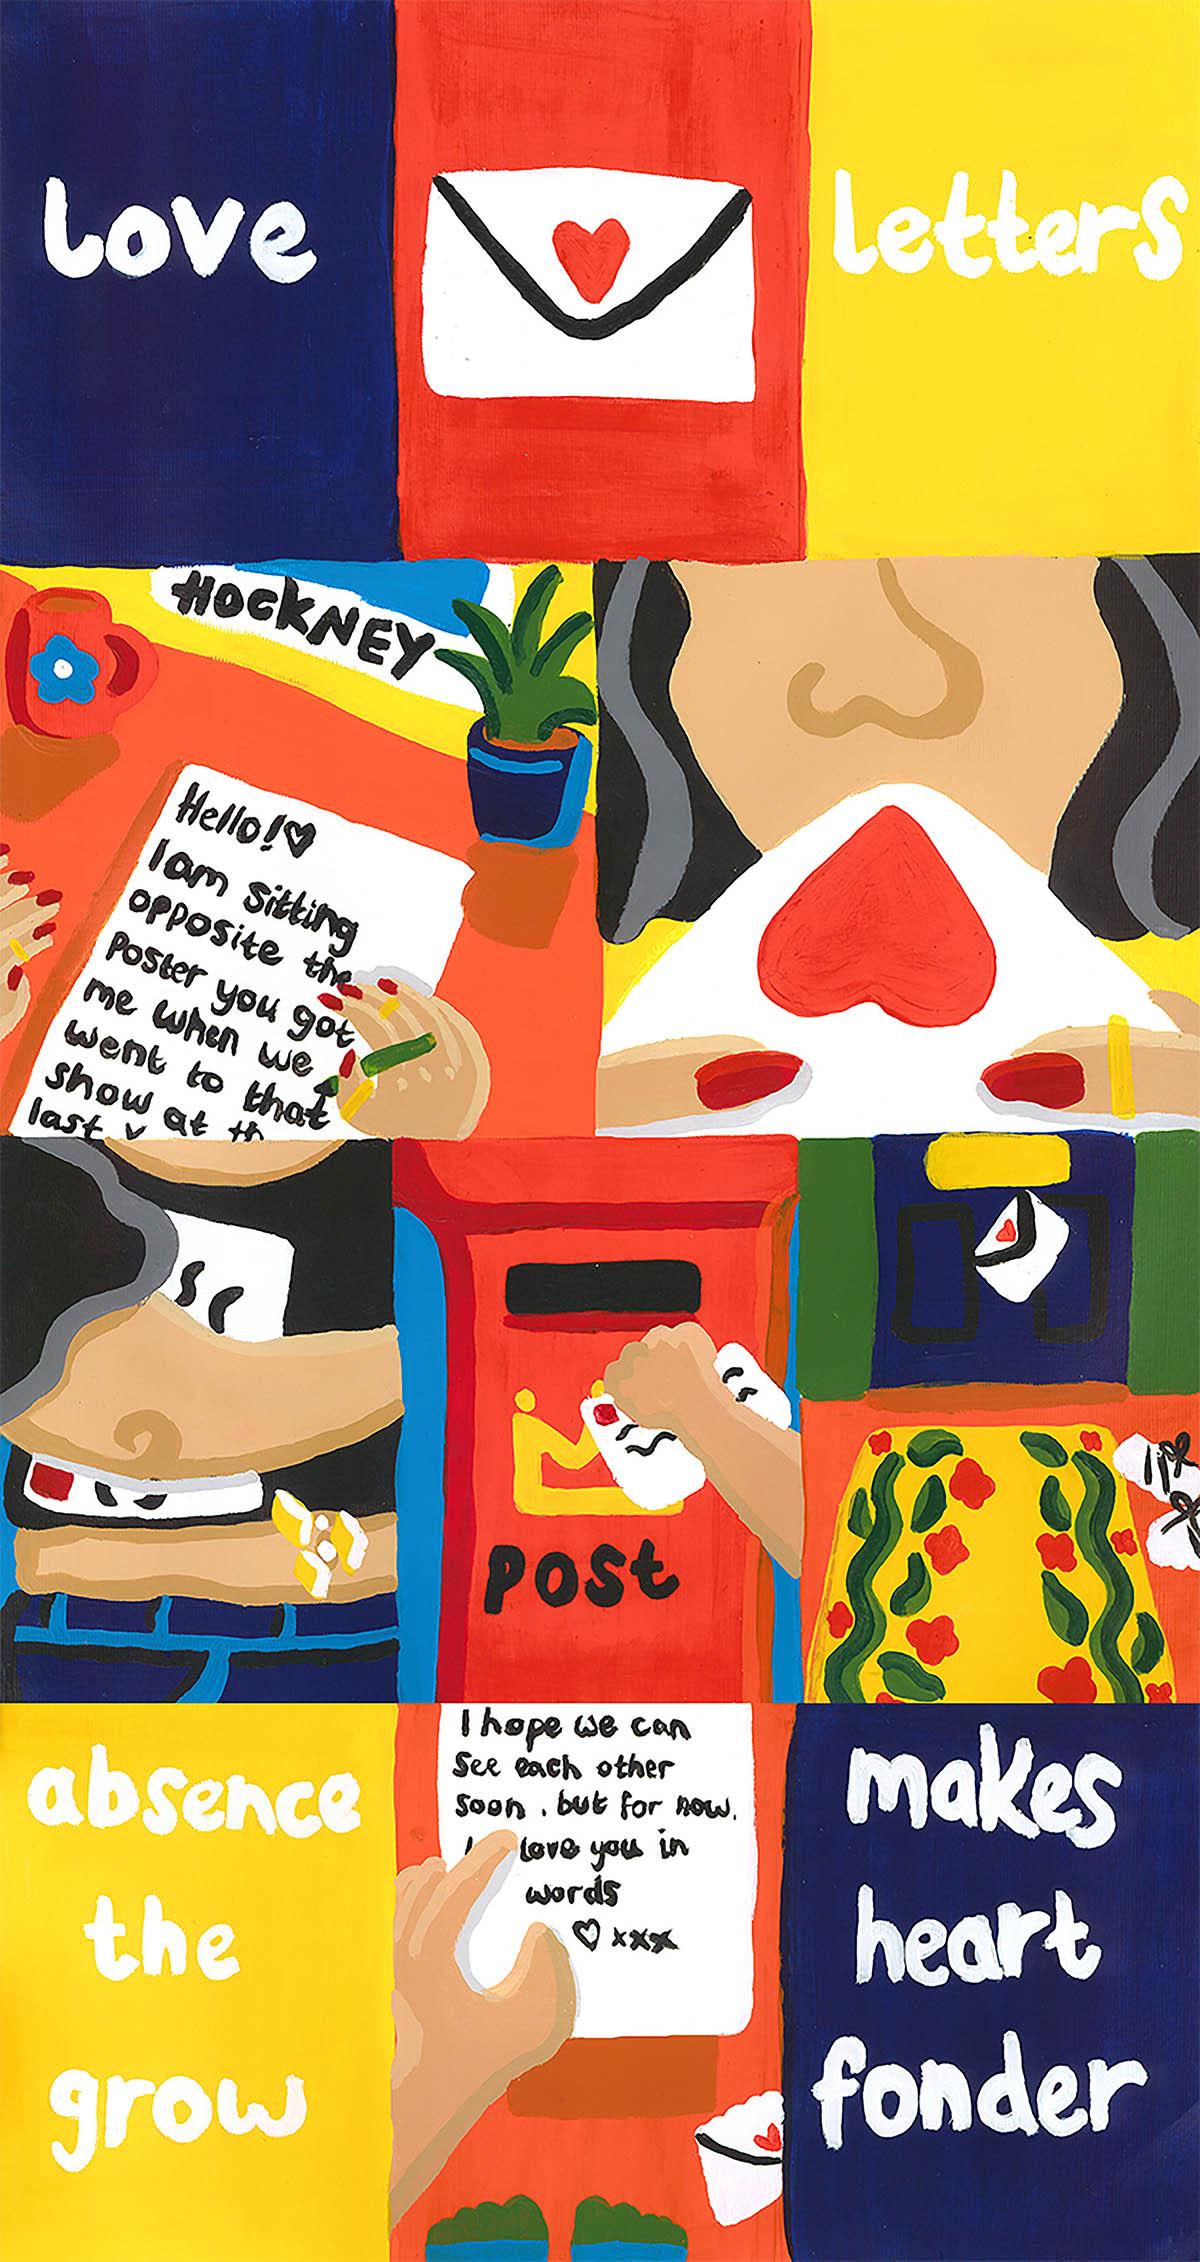 Illustrator & Maker. Rosie May